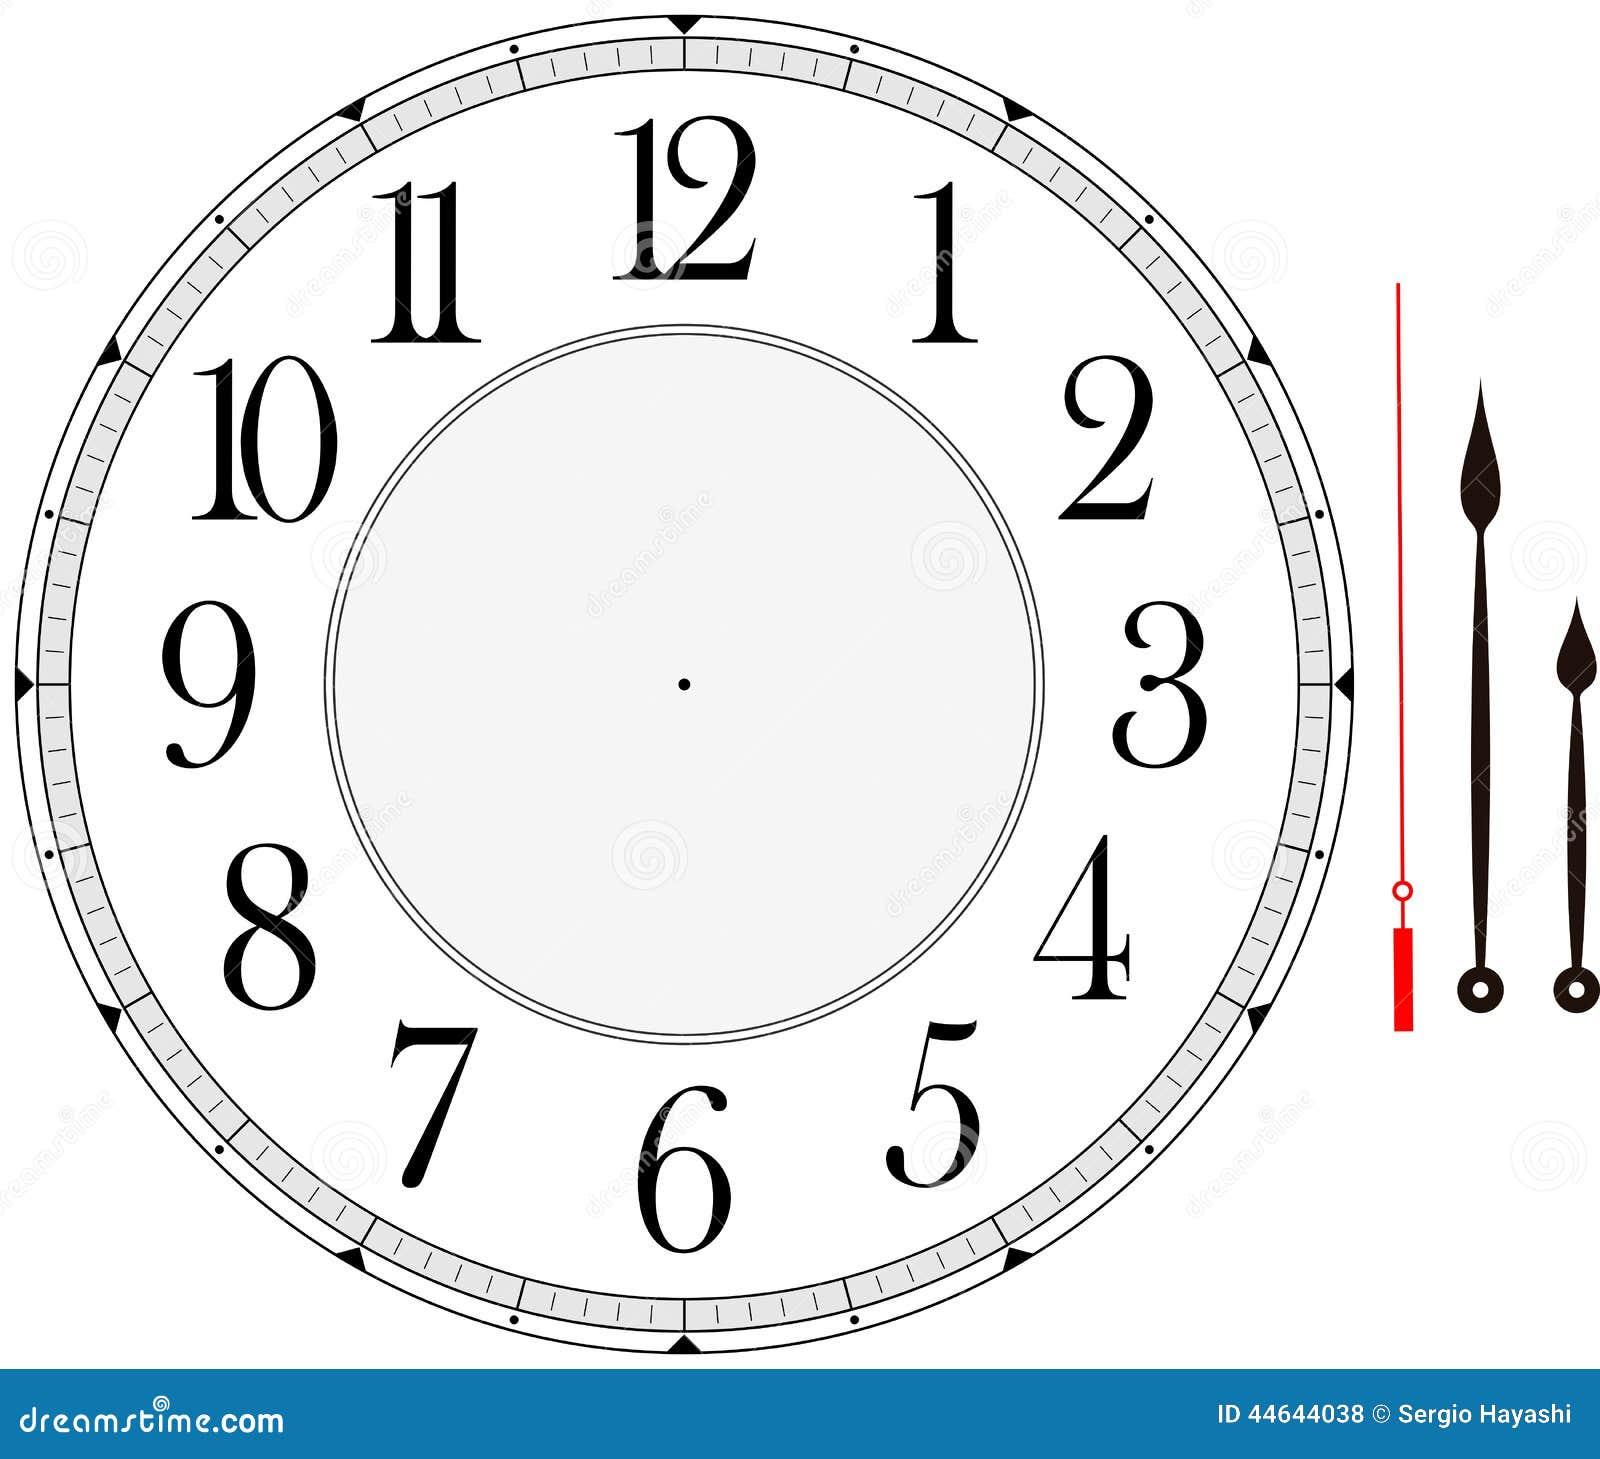 Face Template Printable: Blank Face Template Printable, Blank Clock ...